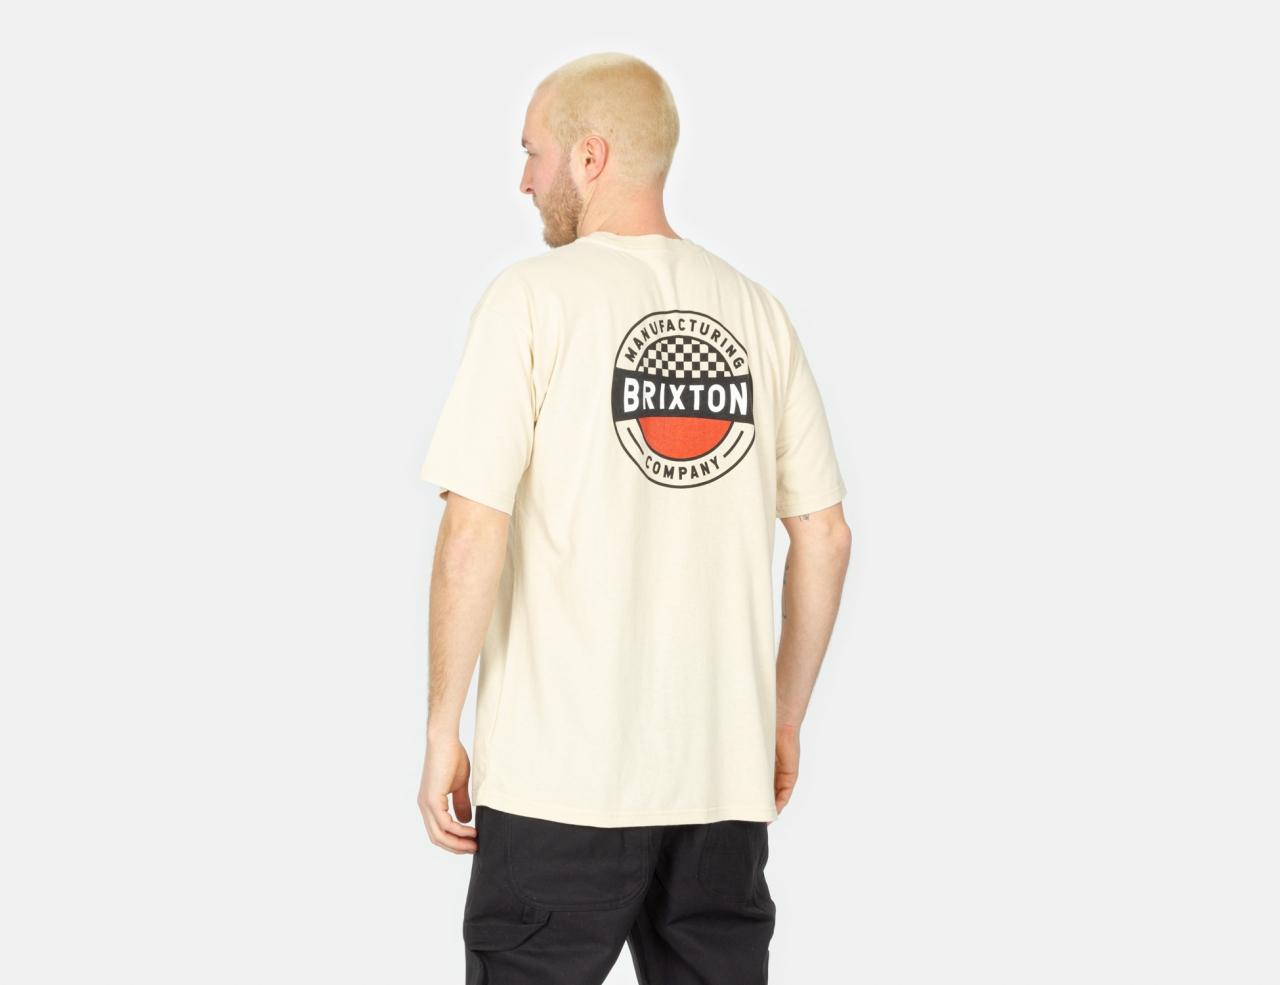 Brixton Terminal T-Shirt - Worn Wash Cream